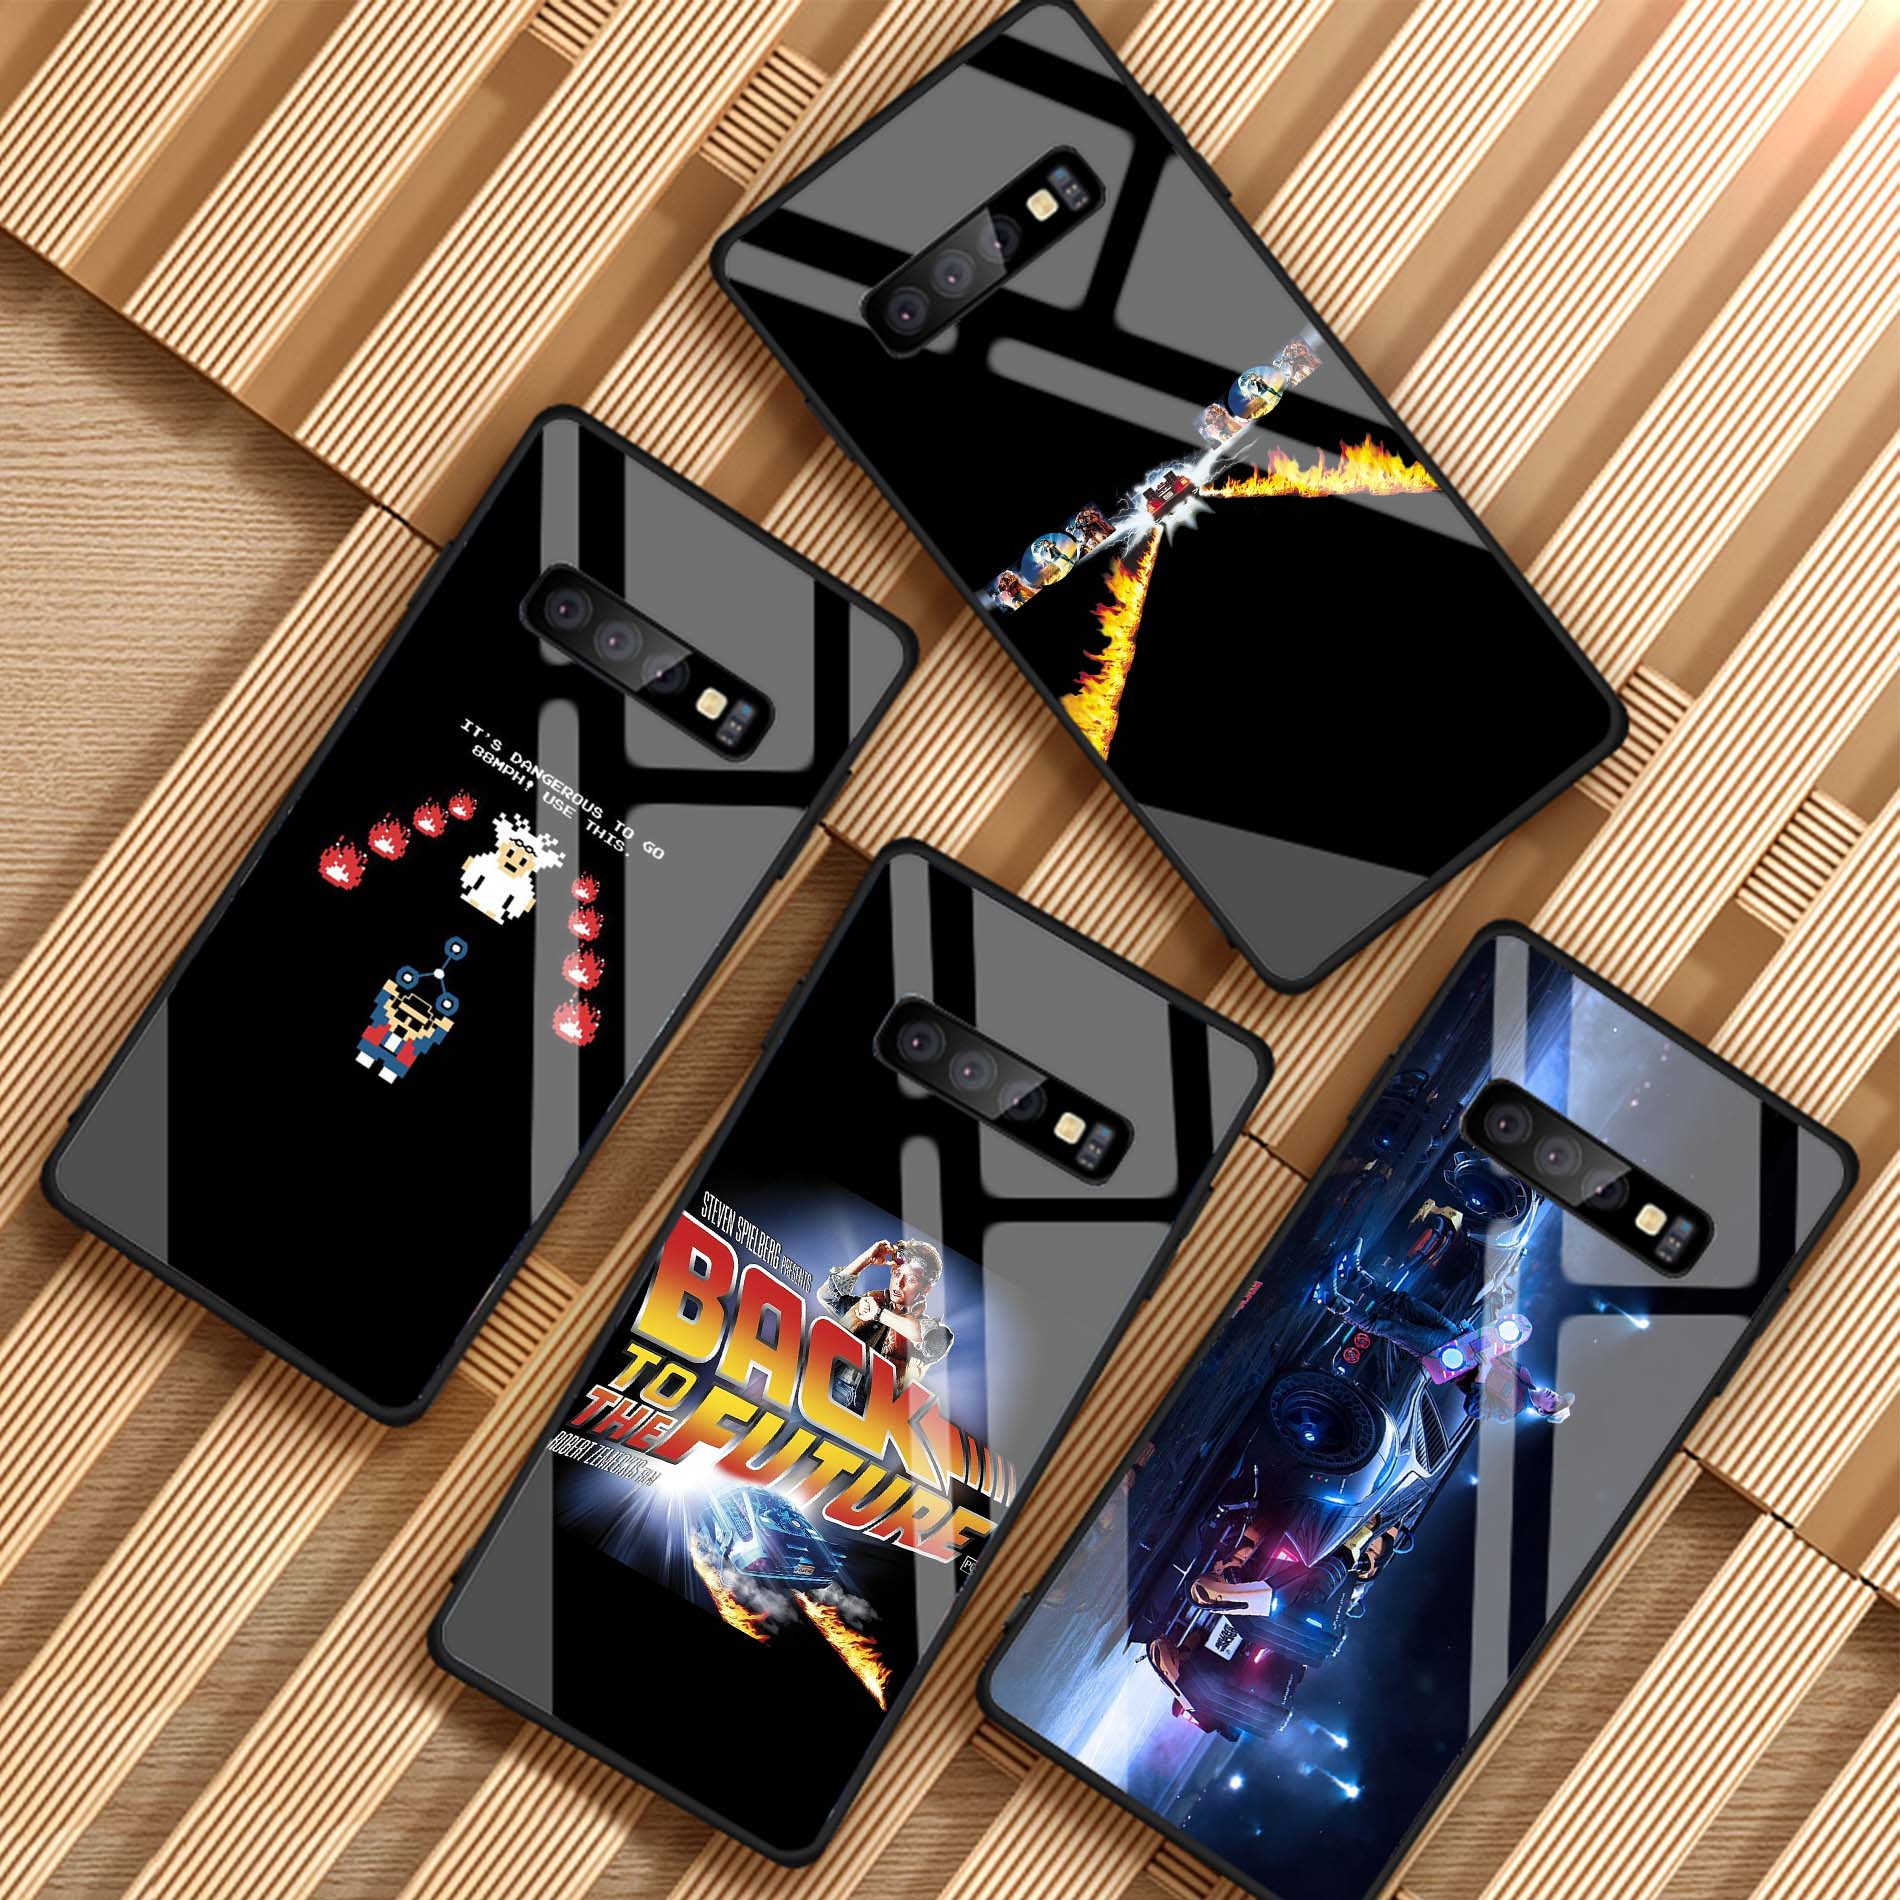 Para el futuro de templado de vidrio de caso de teléfono para Samsung Galaxy A6 A6S A8 J6 J8 2018 Nota 8 9 S8 S9 S10 PLUS